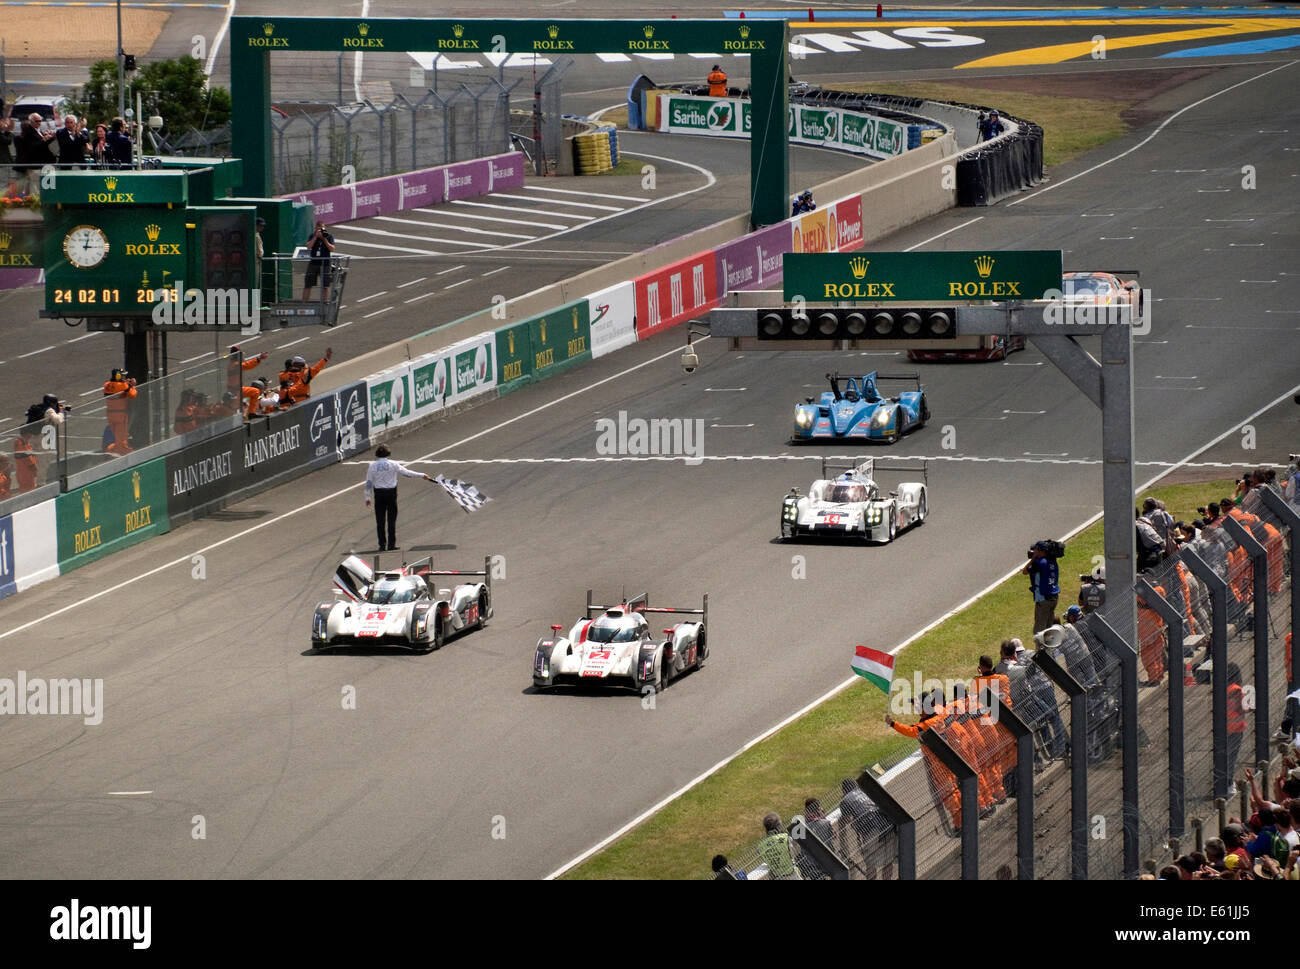 Finish line of 2014 Le Mans 24 hour race Audi R18 e-tron car number 2 the winner Stock Photo